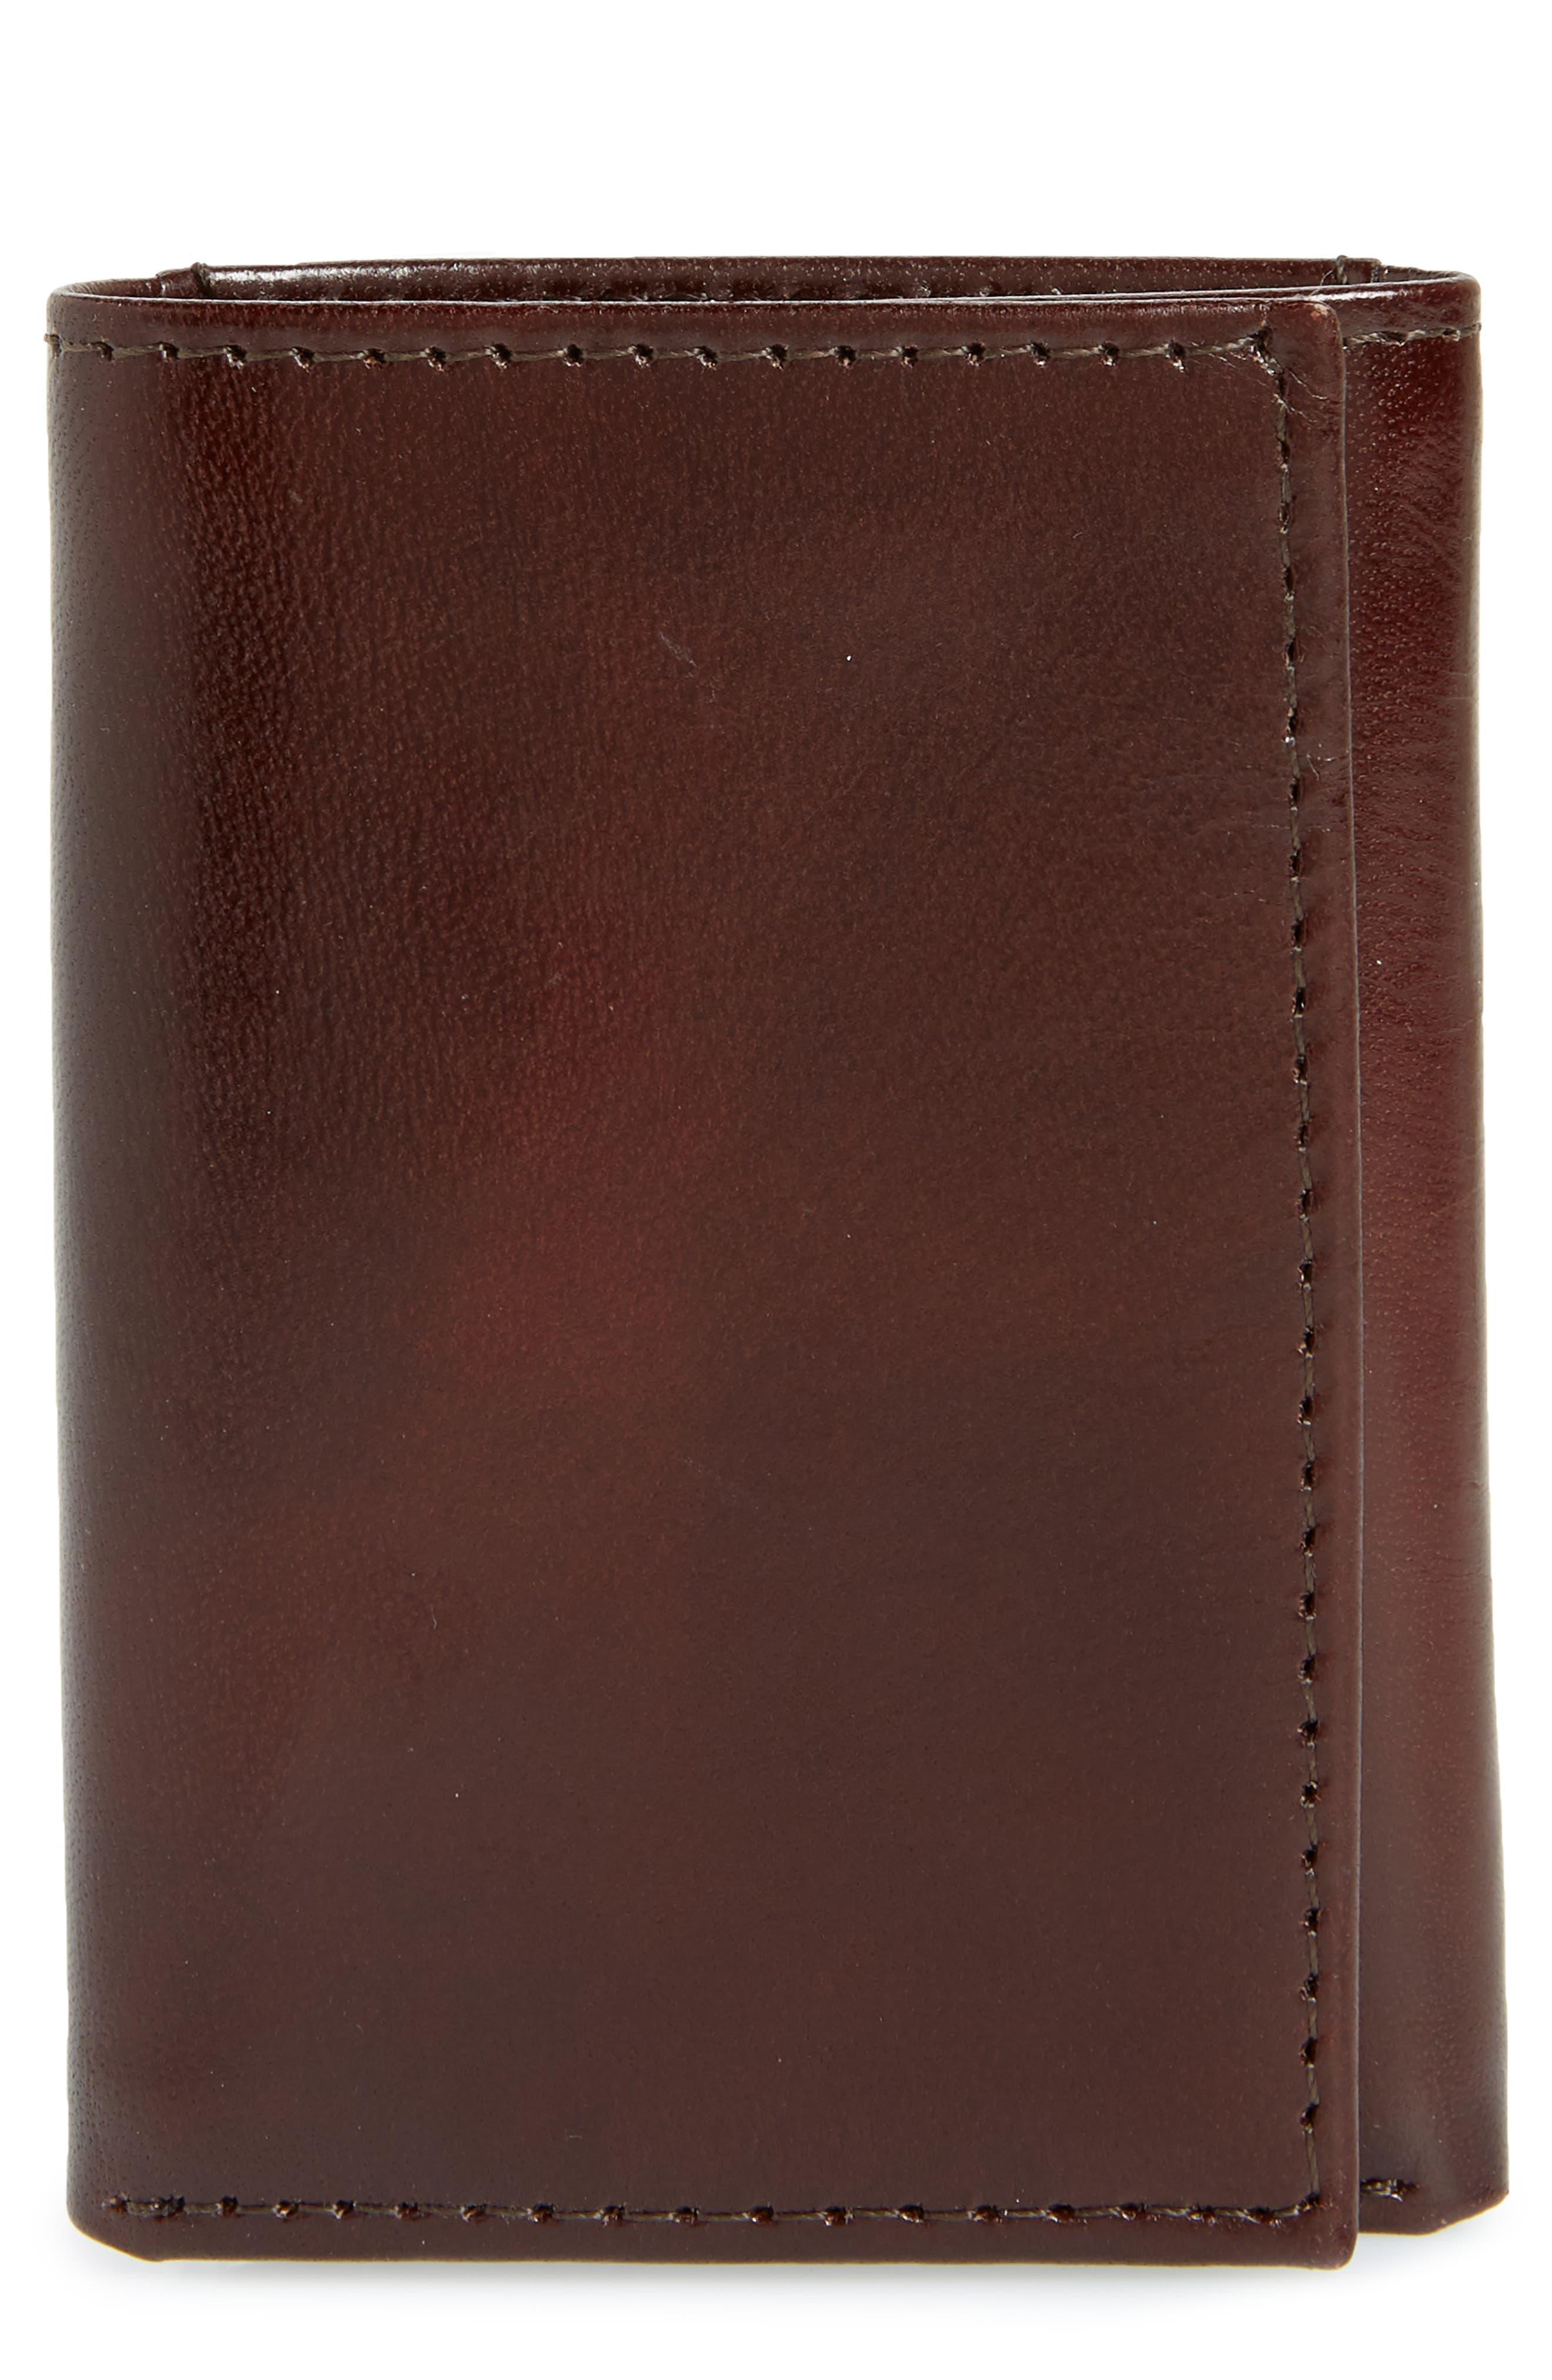 Main Image - Johnston & Murphy Leather Wallet